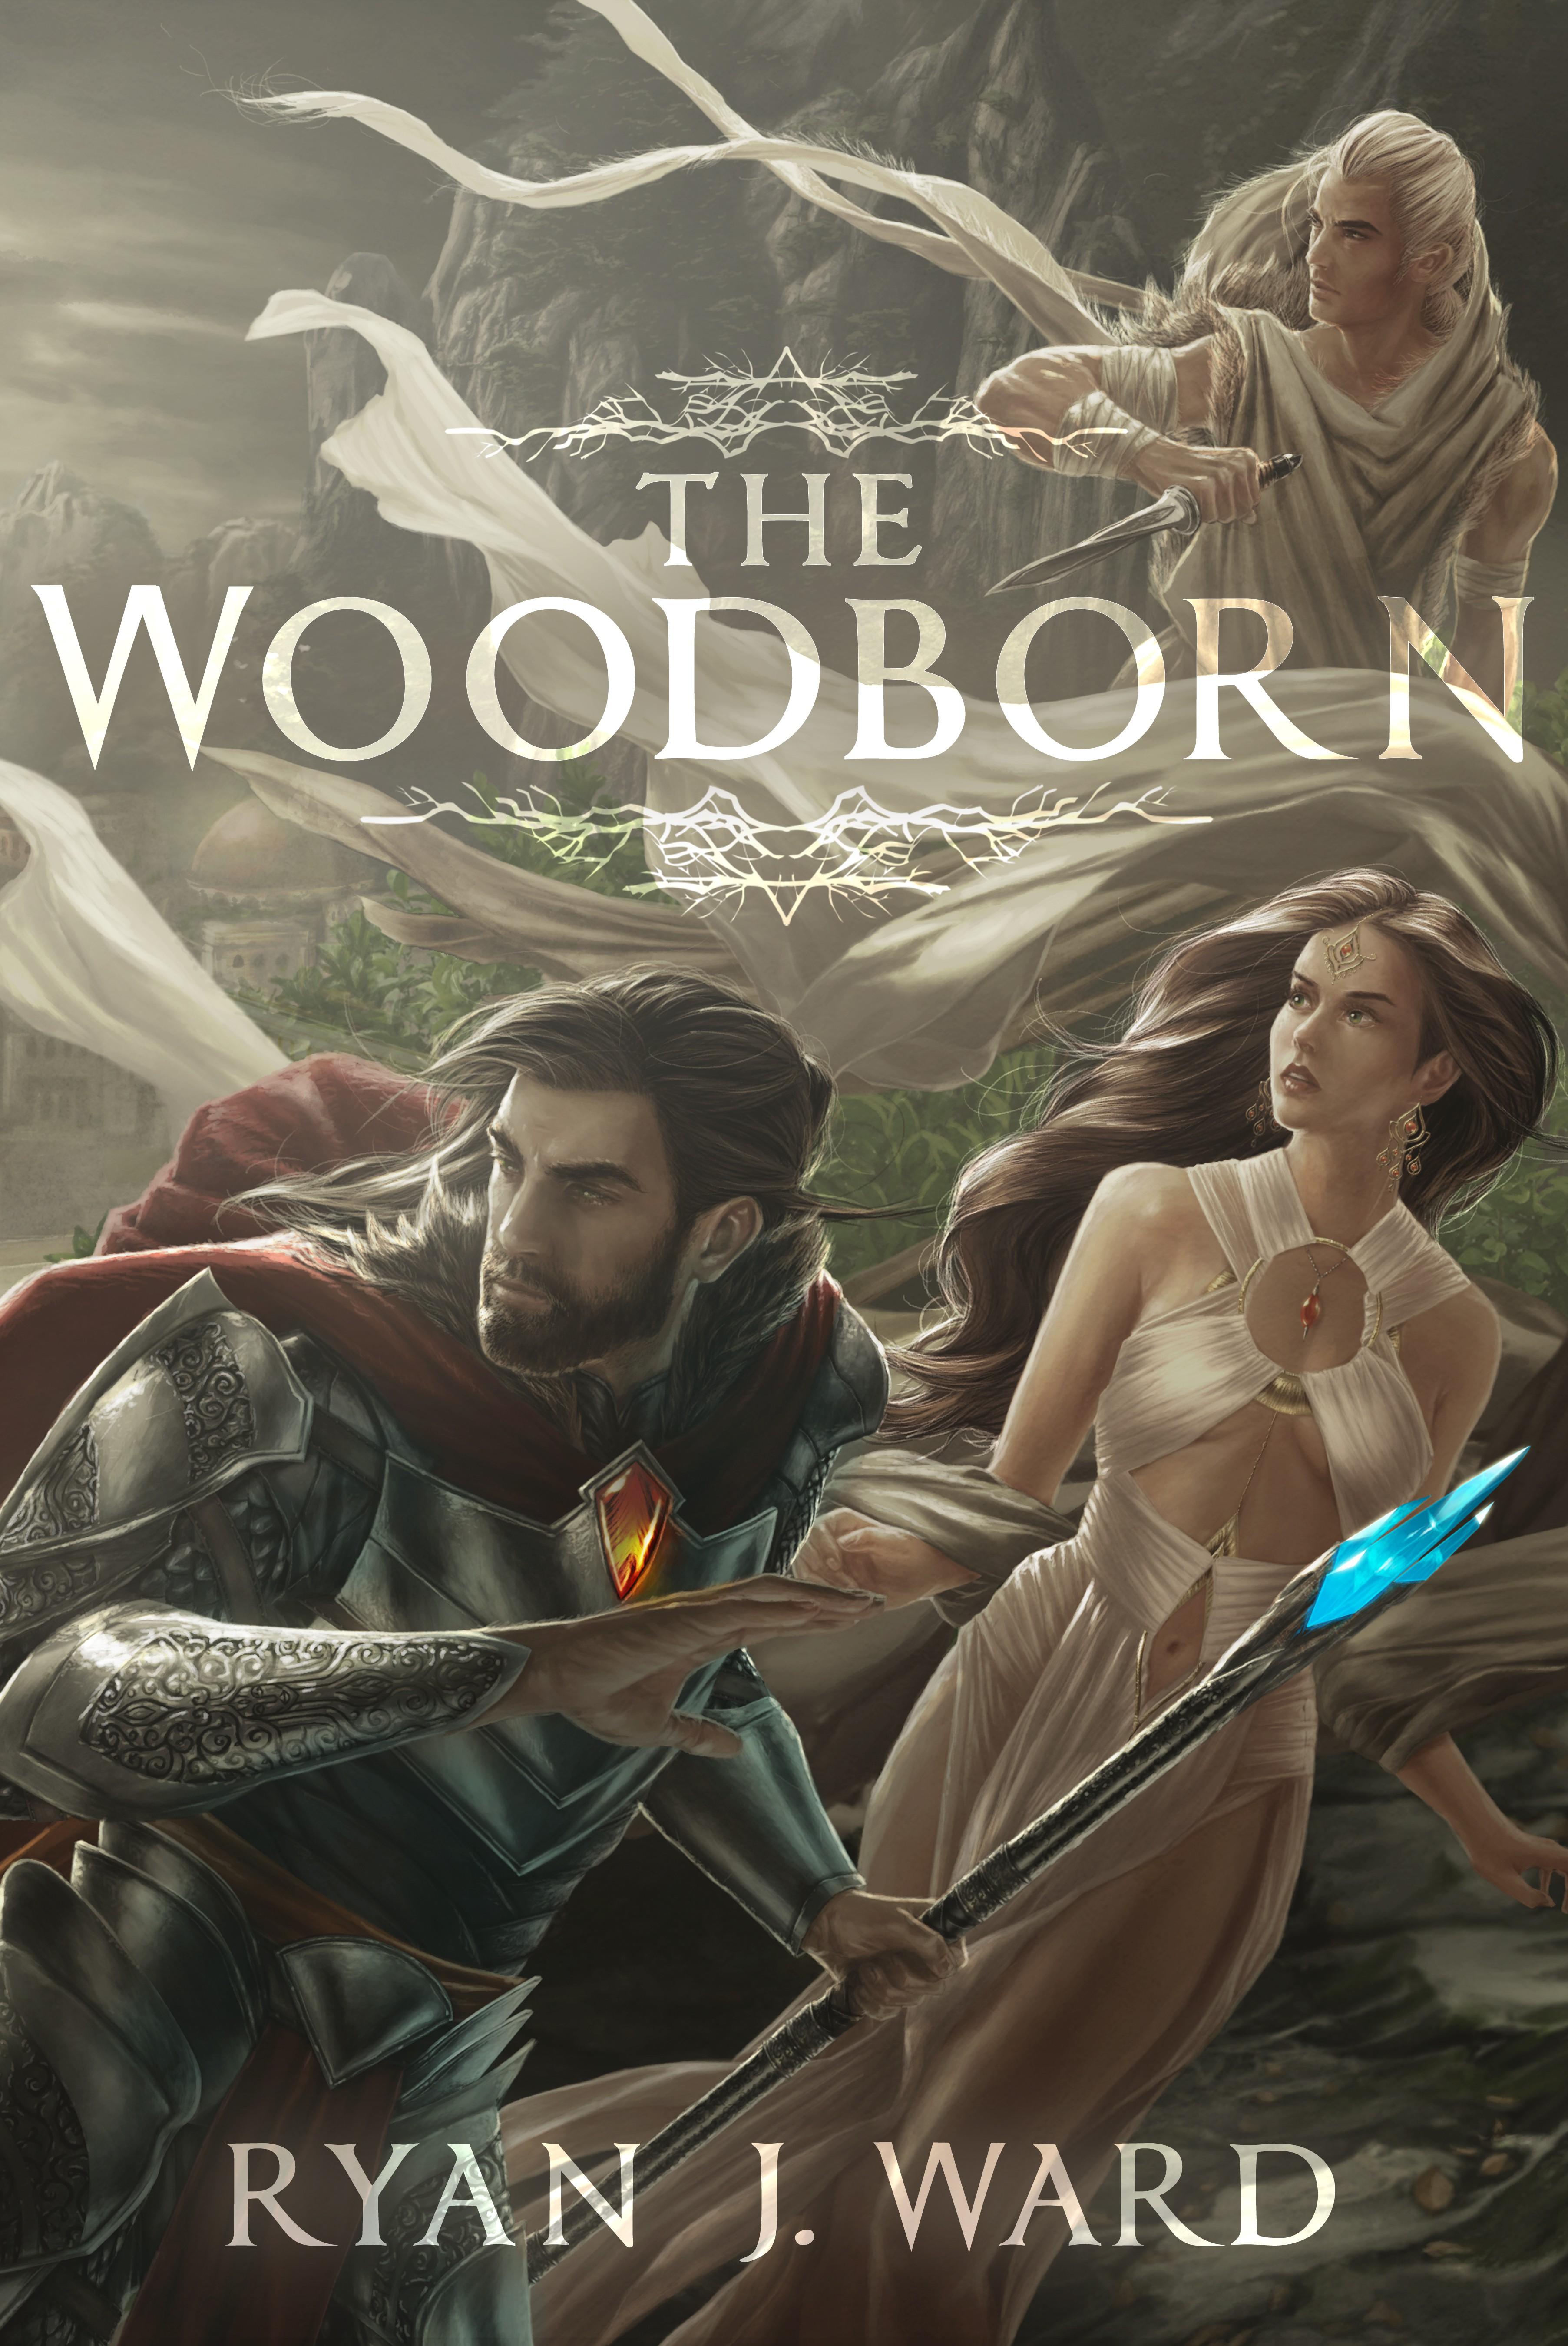 Cover for an Epic fantasy novel